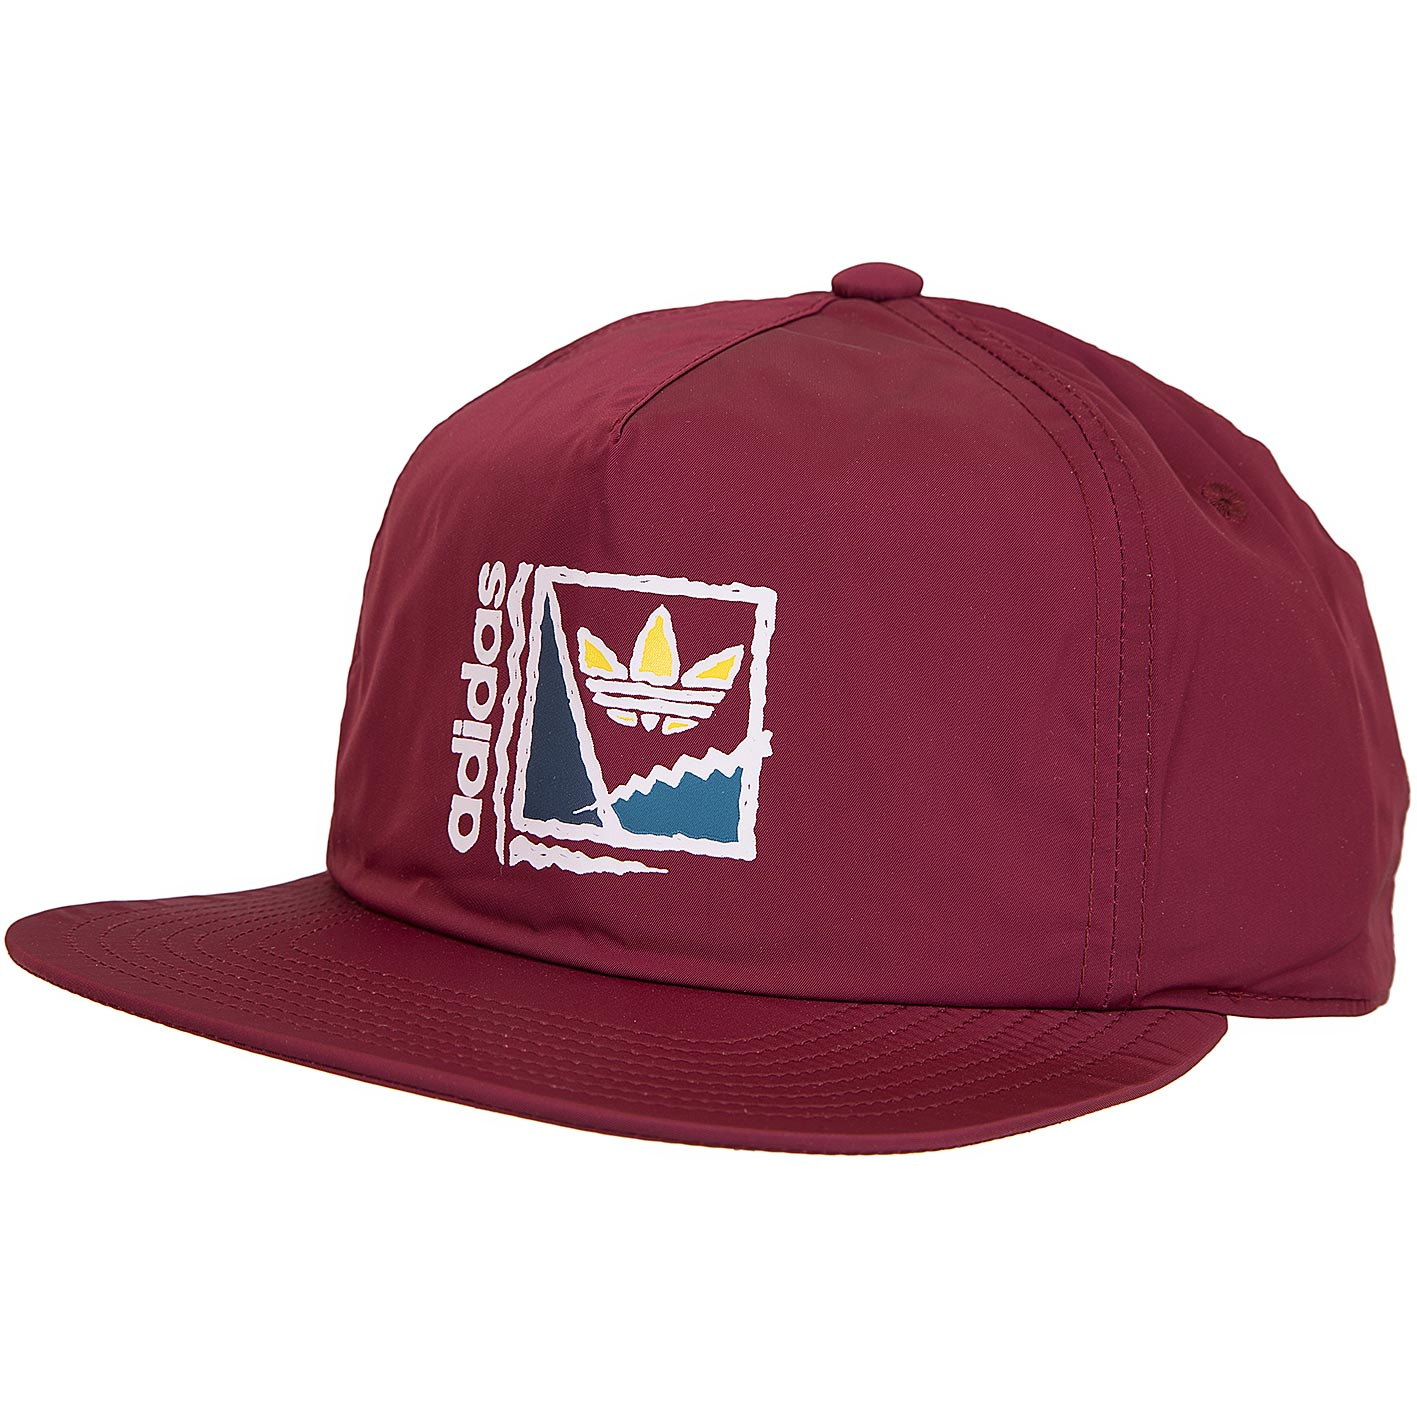 fashion styles sale usa online professional sale Adidas Originals Snapback Cap Courtcrusher weinrot